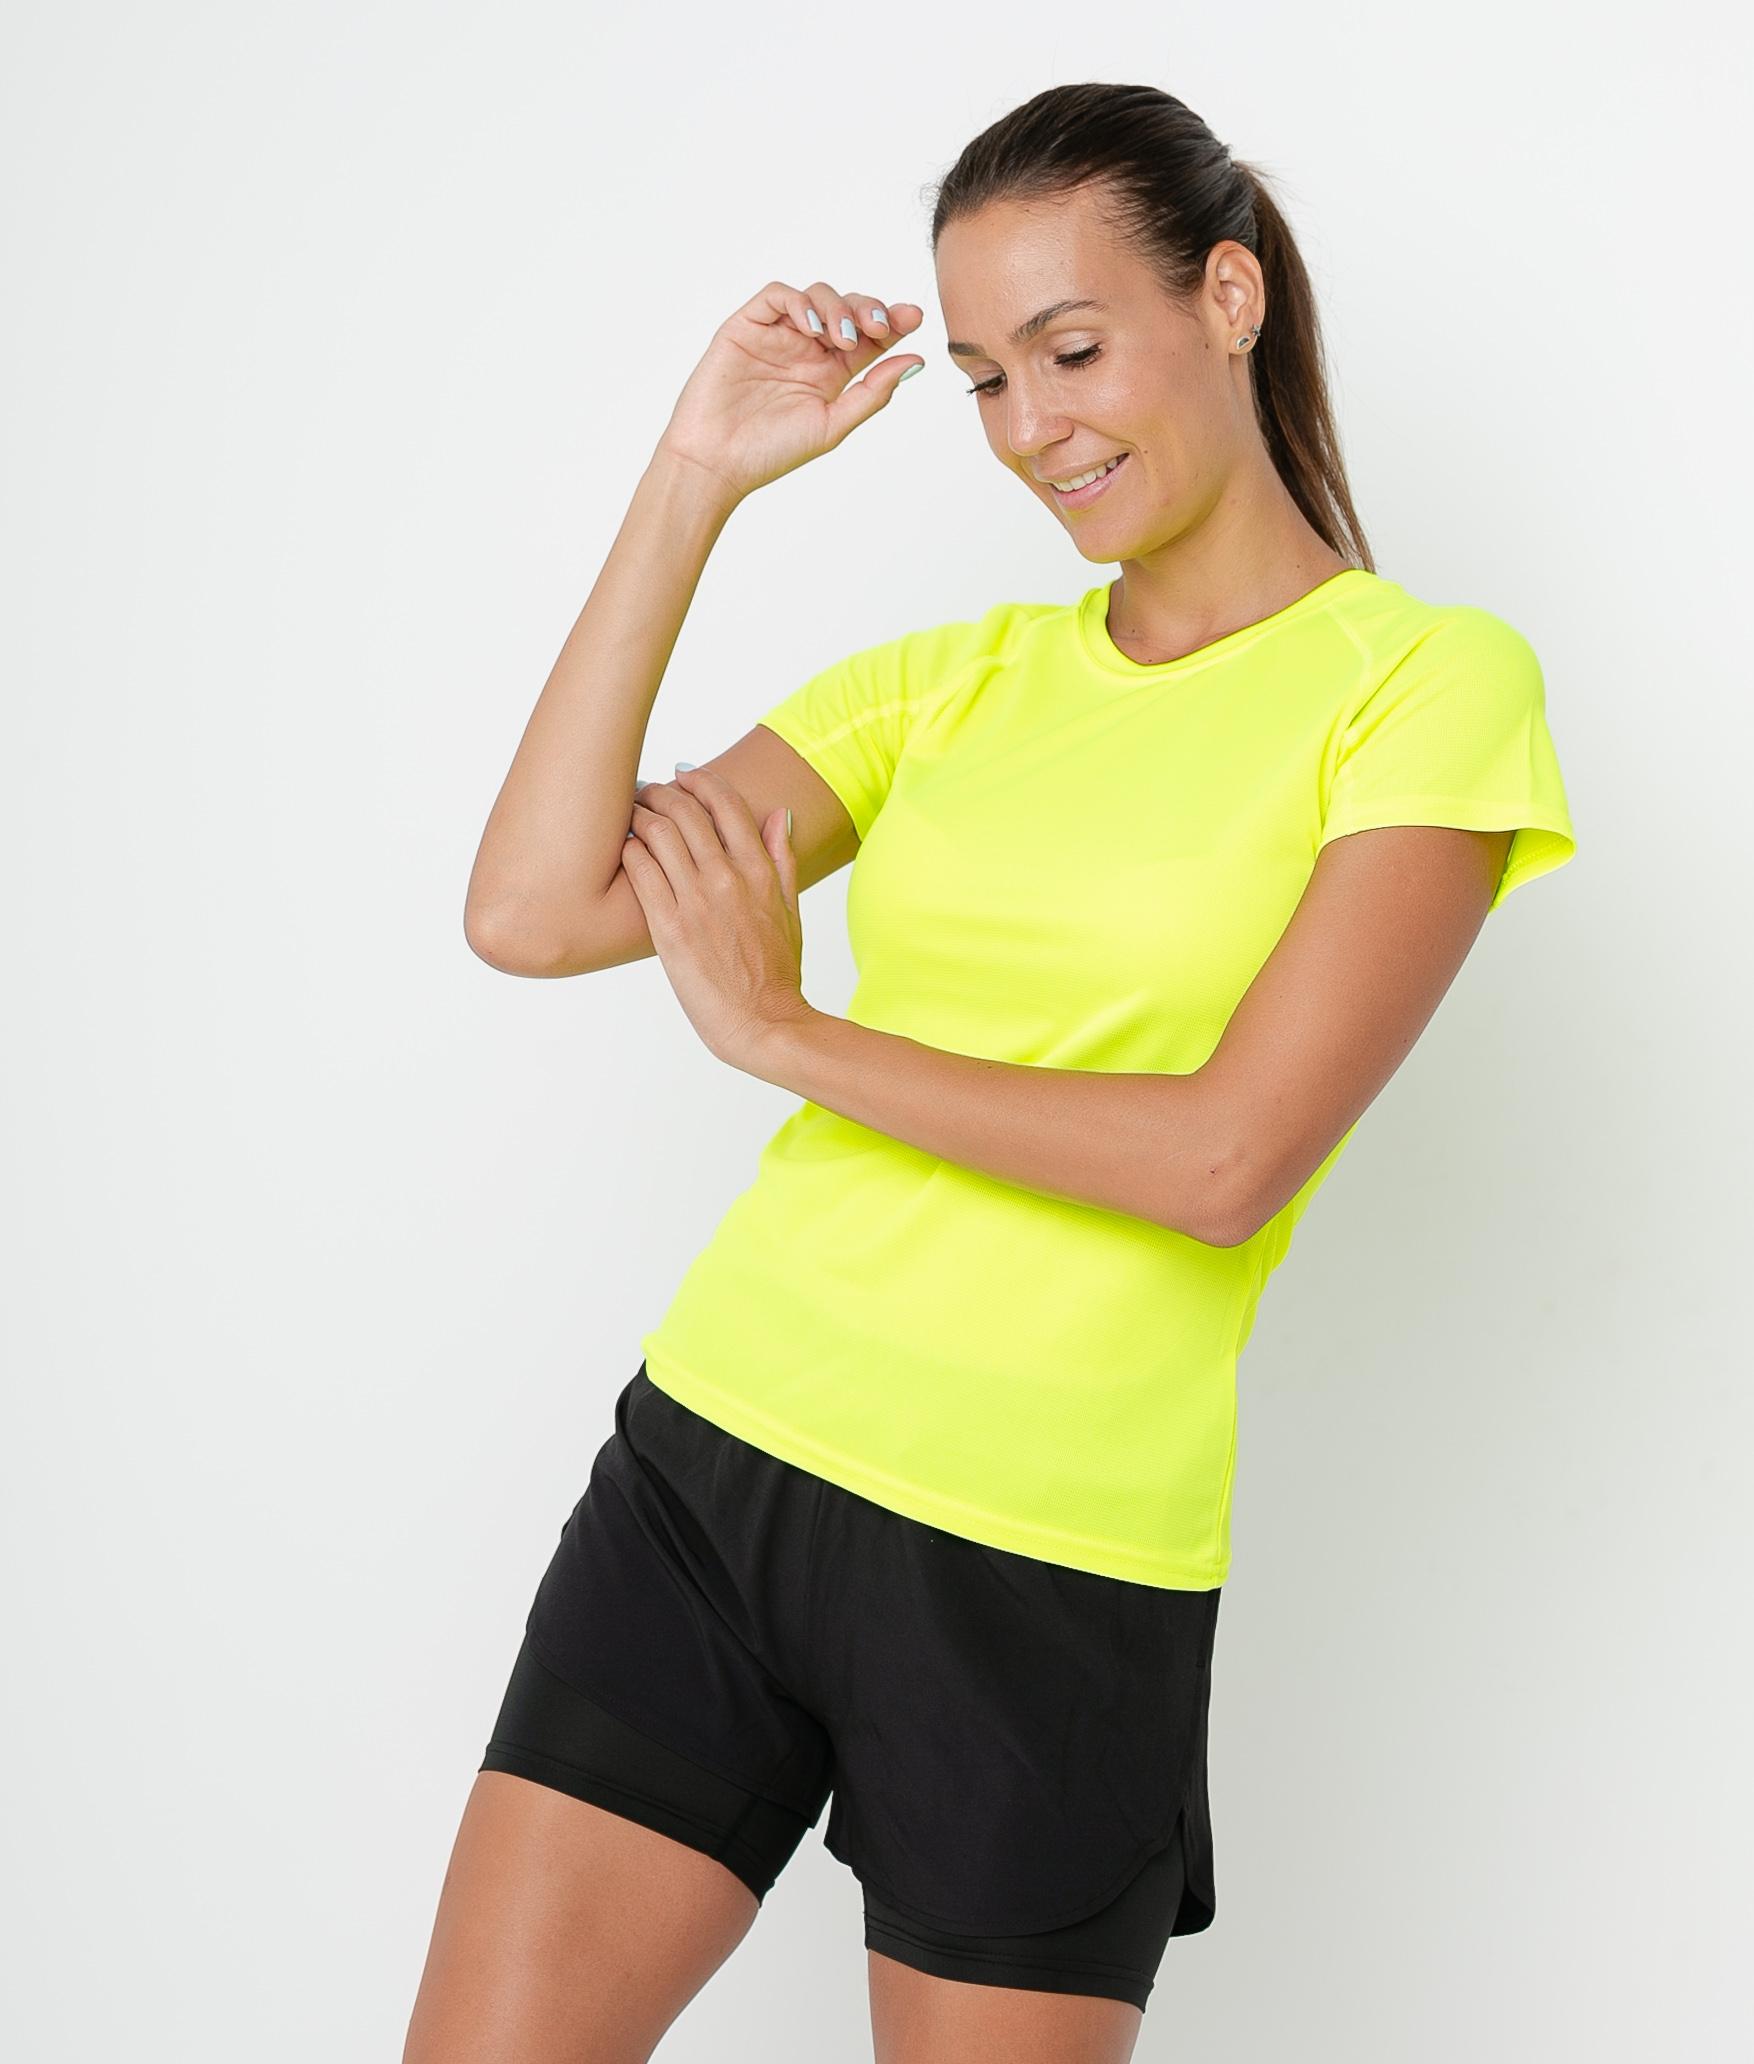 Camiseta Mita - Amarillo Flúor